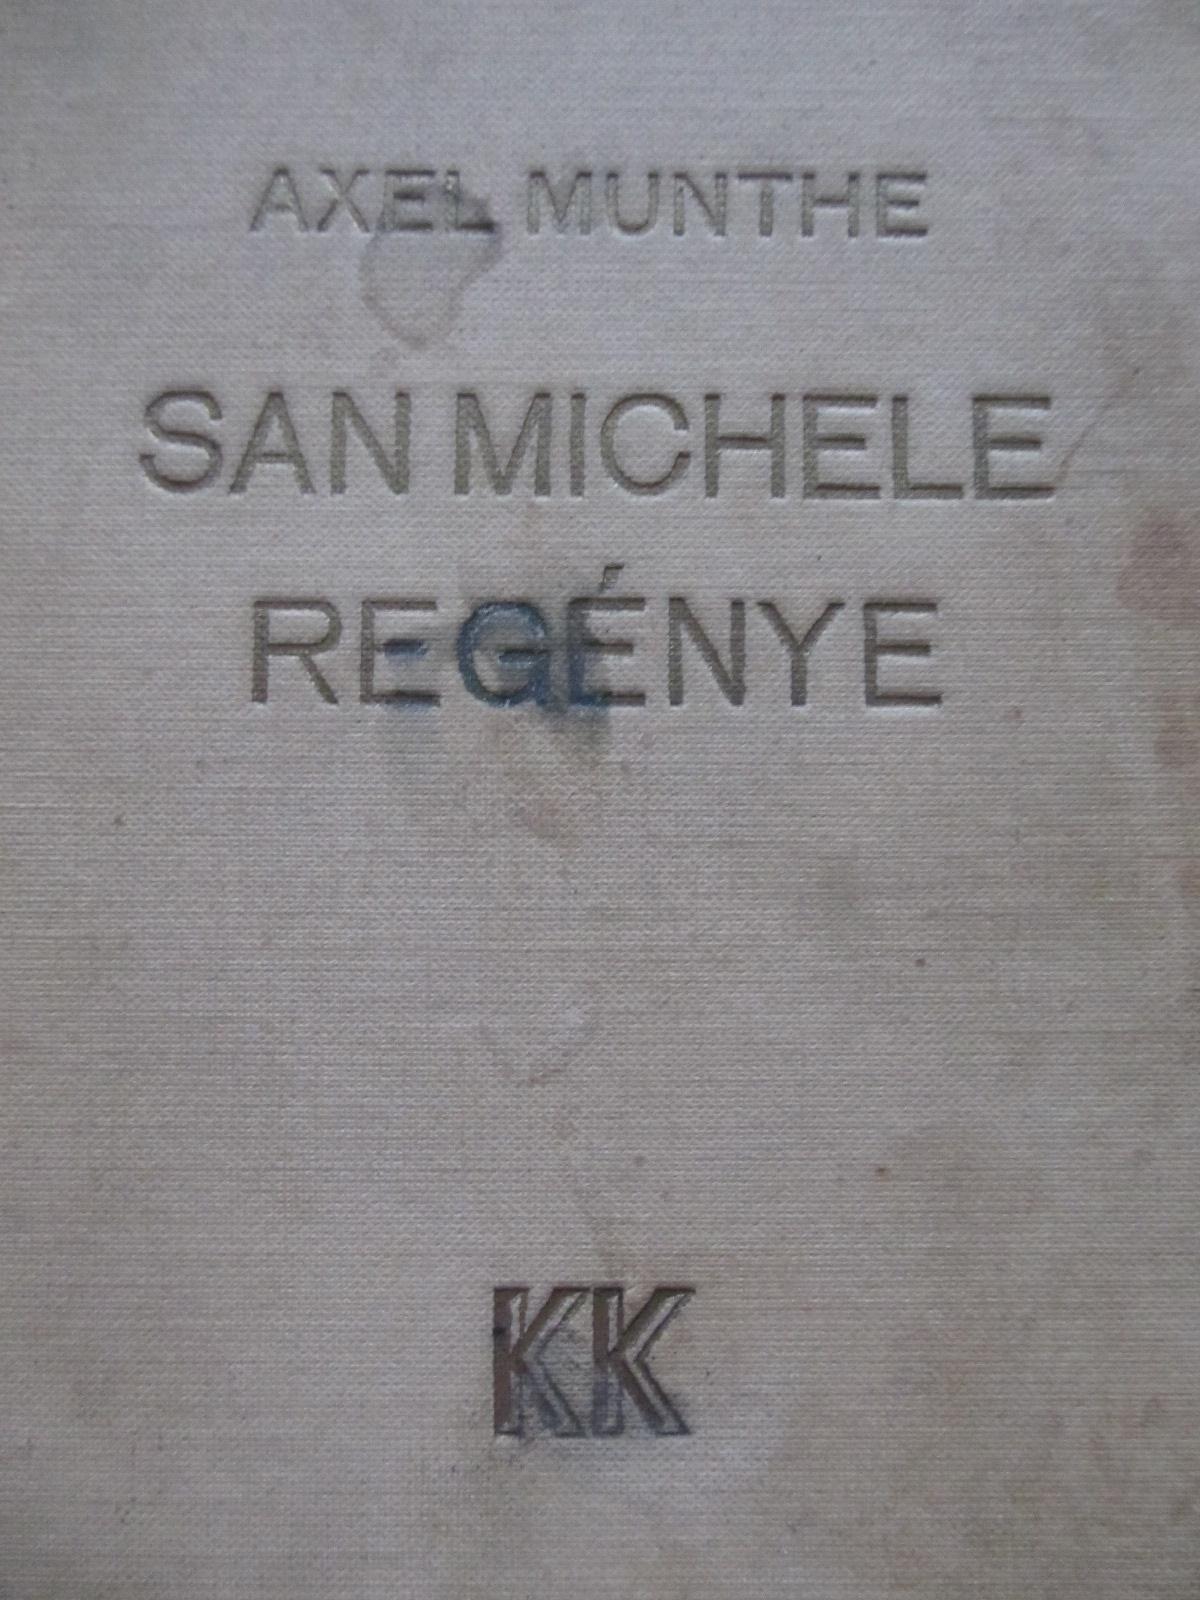 San Michele regenye - Axel Munthe | Detalii carte